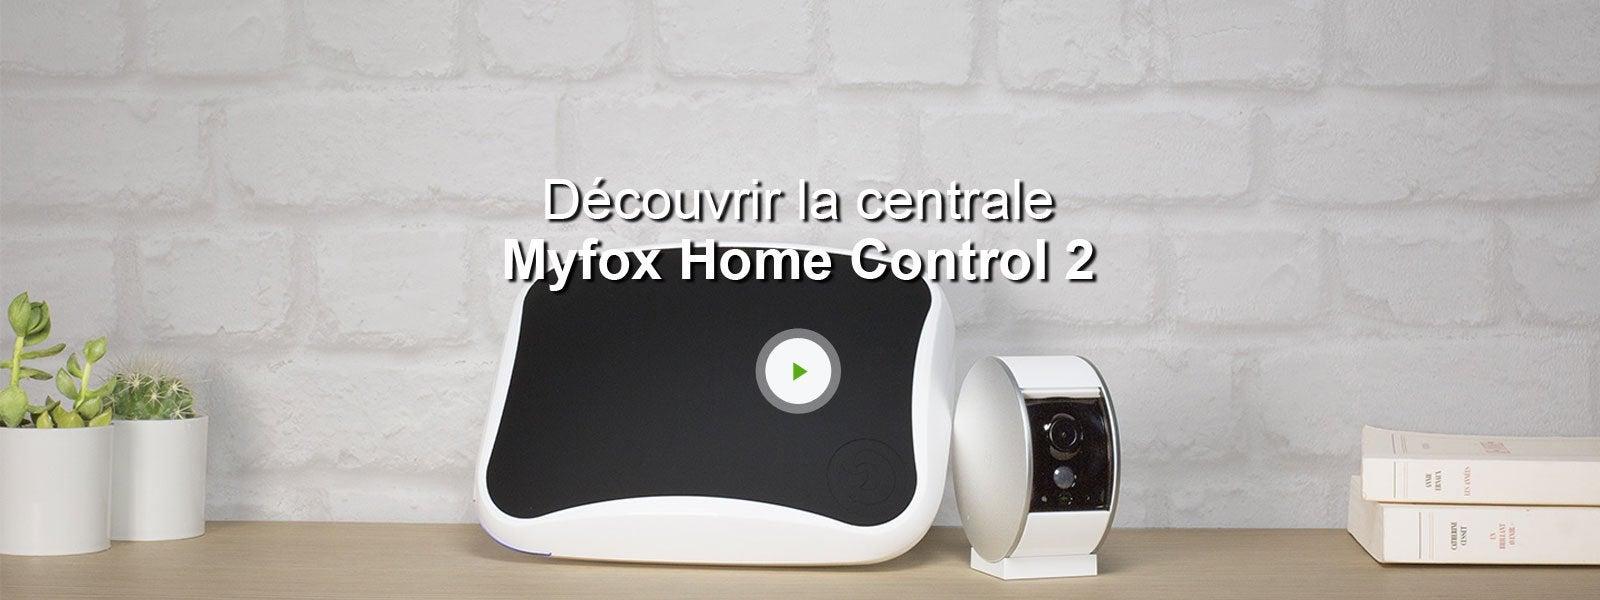 Box domotique radio evology leroy merlin - Myfox home control ...